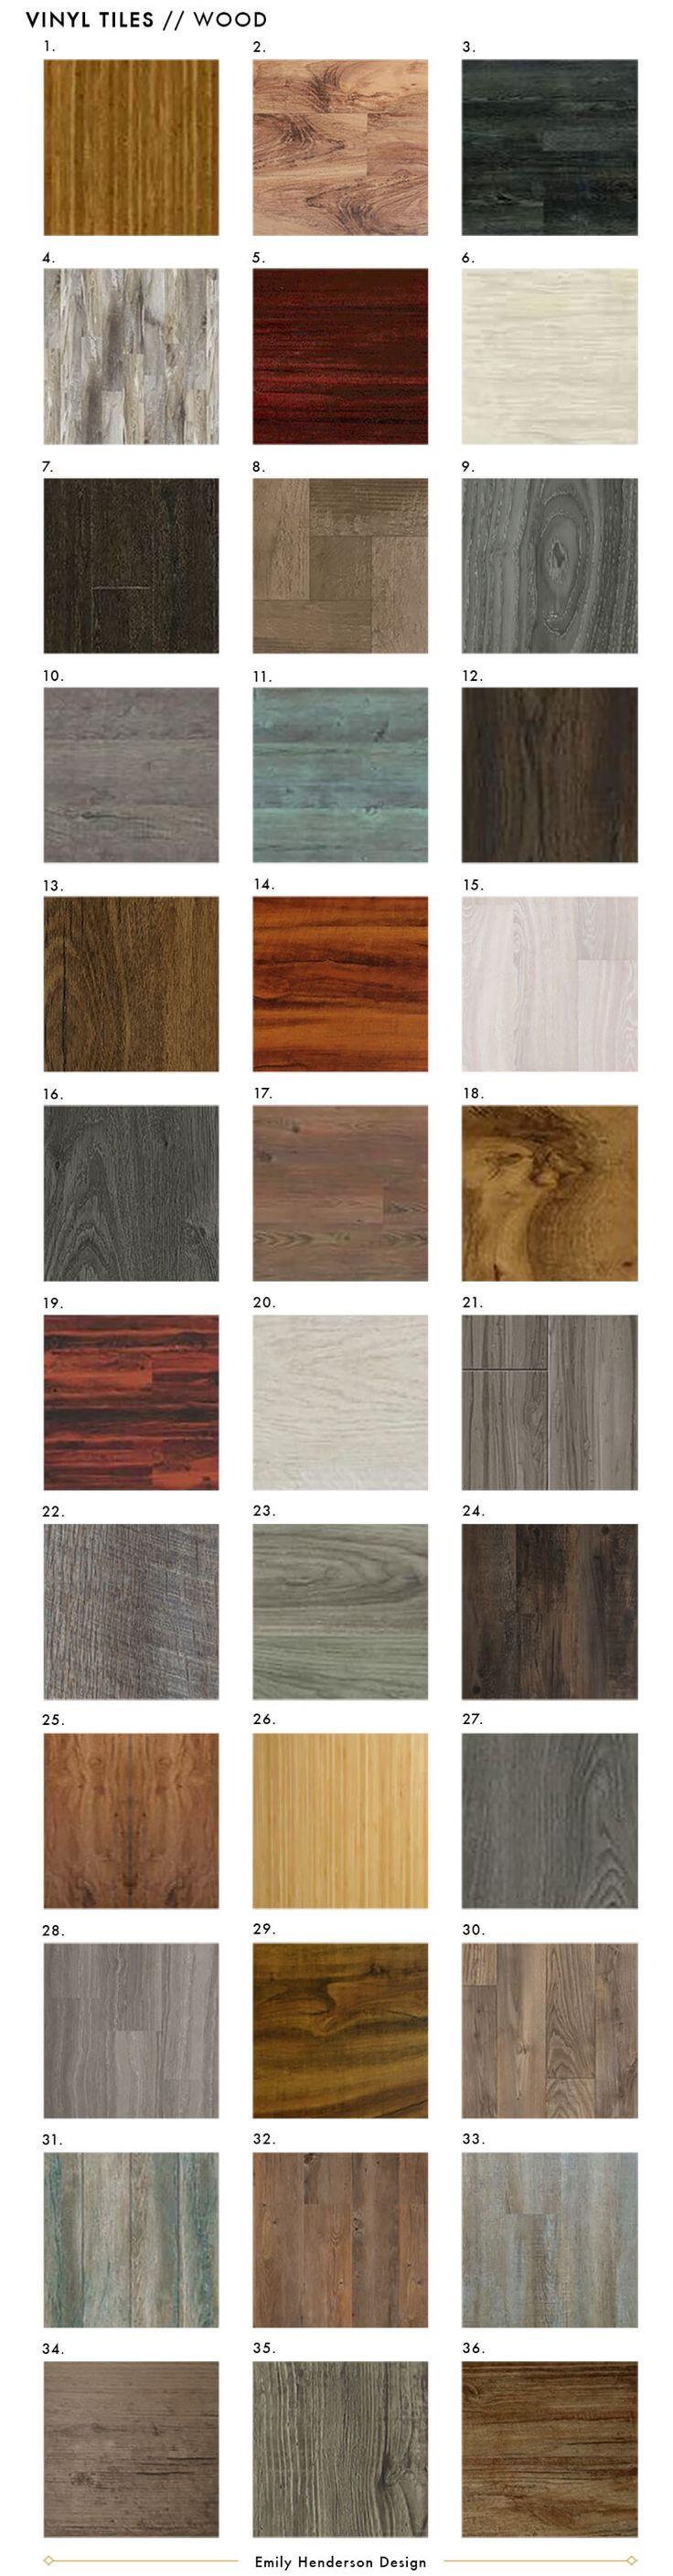 hosking hardwood flooring reviews of 23 best vinyl flooring images on pinterest vinyl tiles floors and with regard to best affordable faux wood vinyl tile